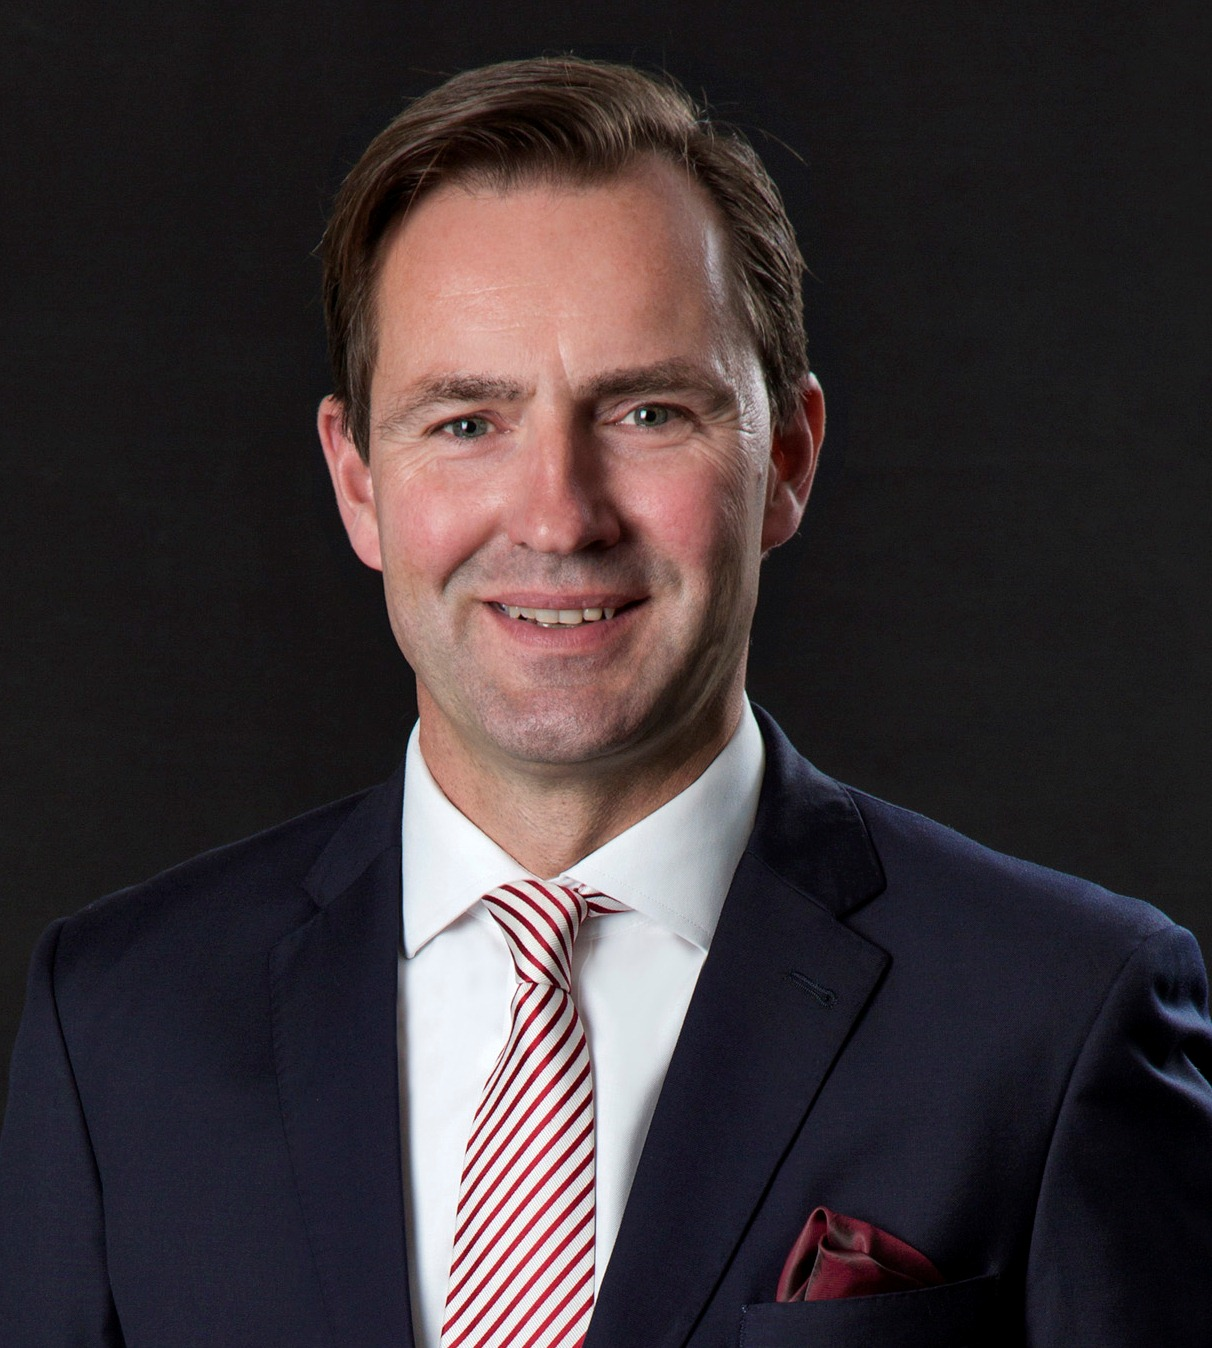 Томас Шефер Председатель Совета директоров Škoda